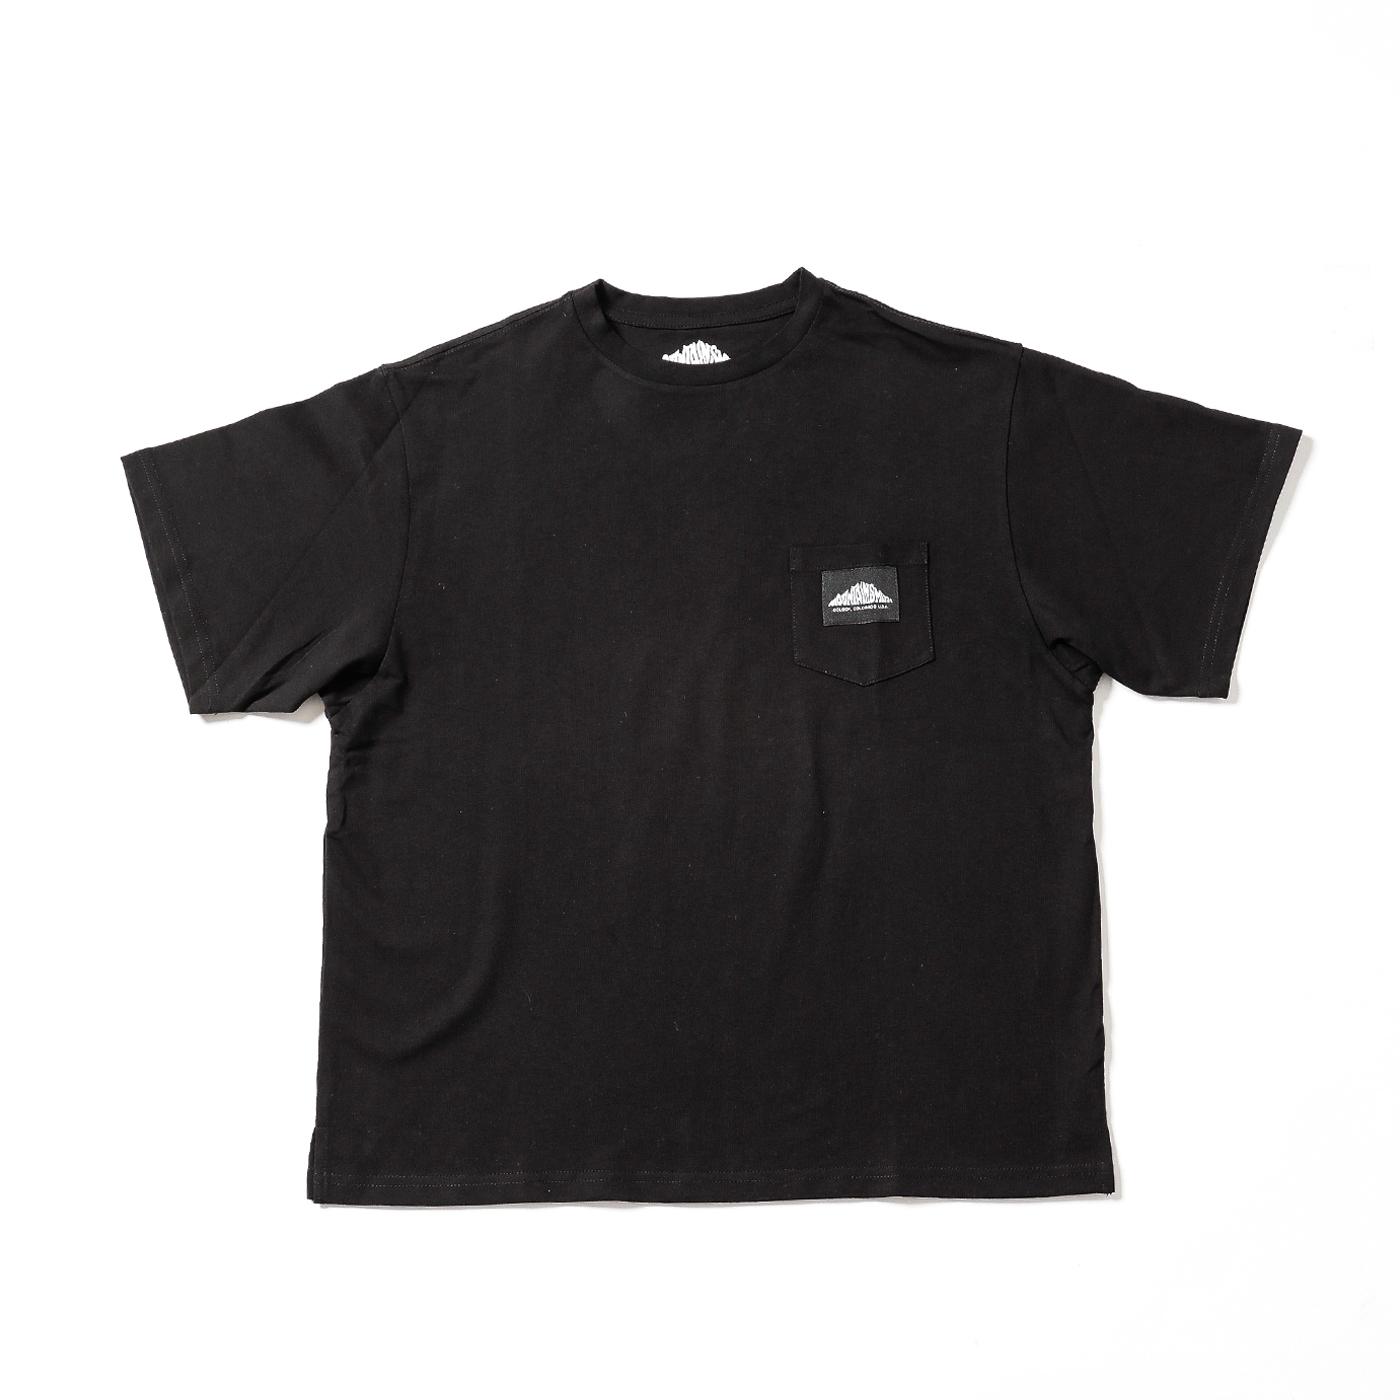 product: MS EMBRO / color: BLACK 1